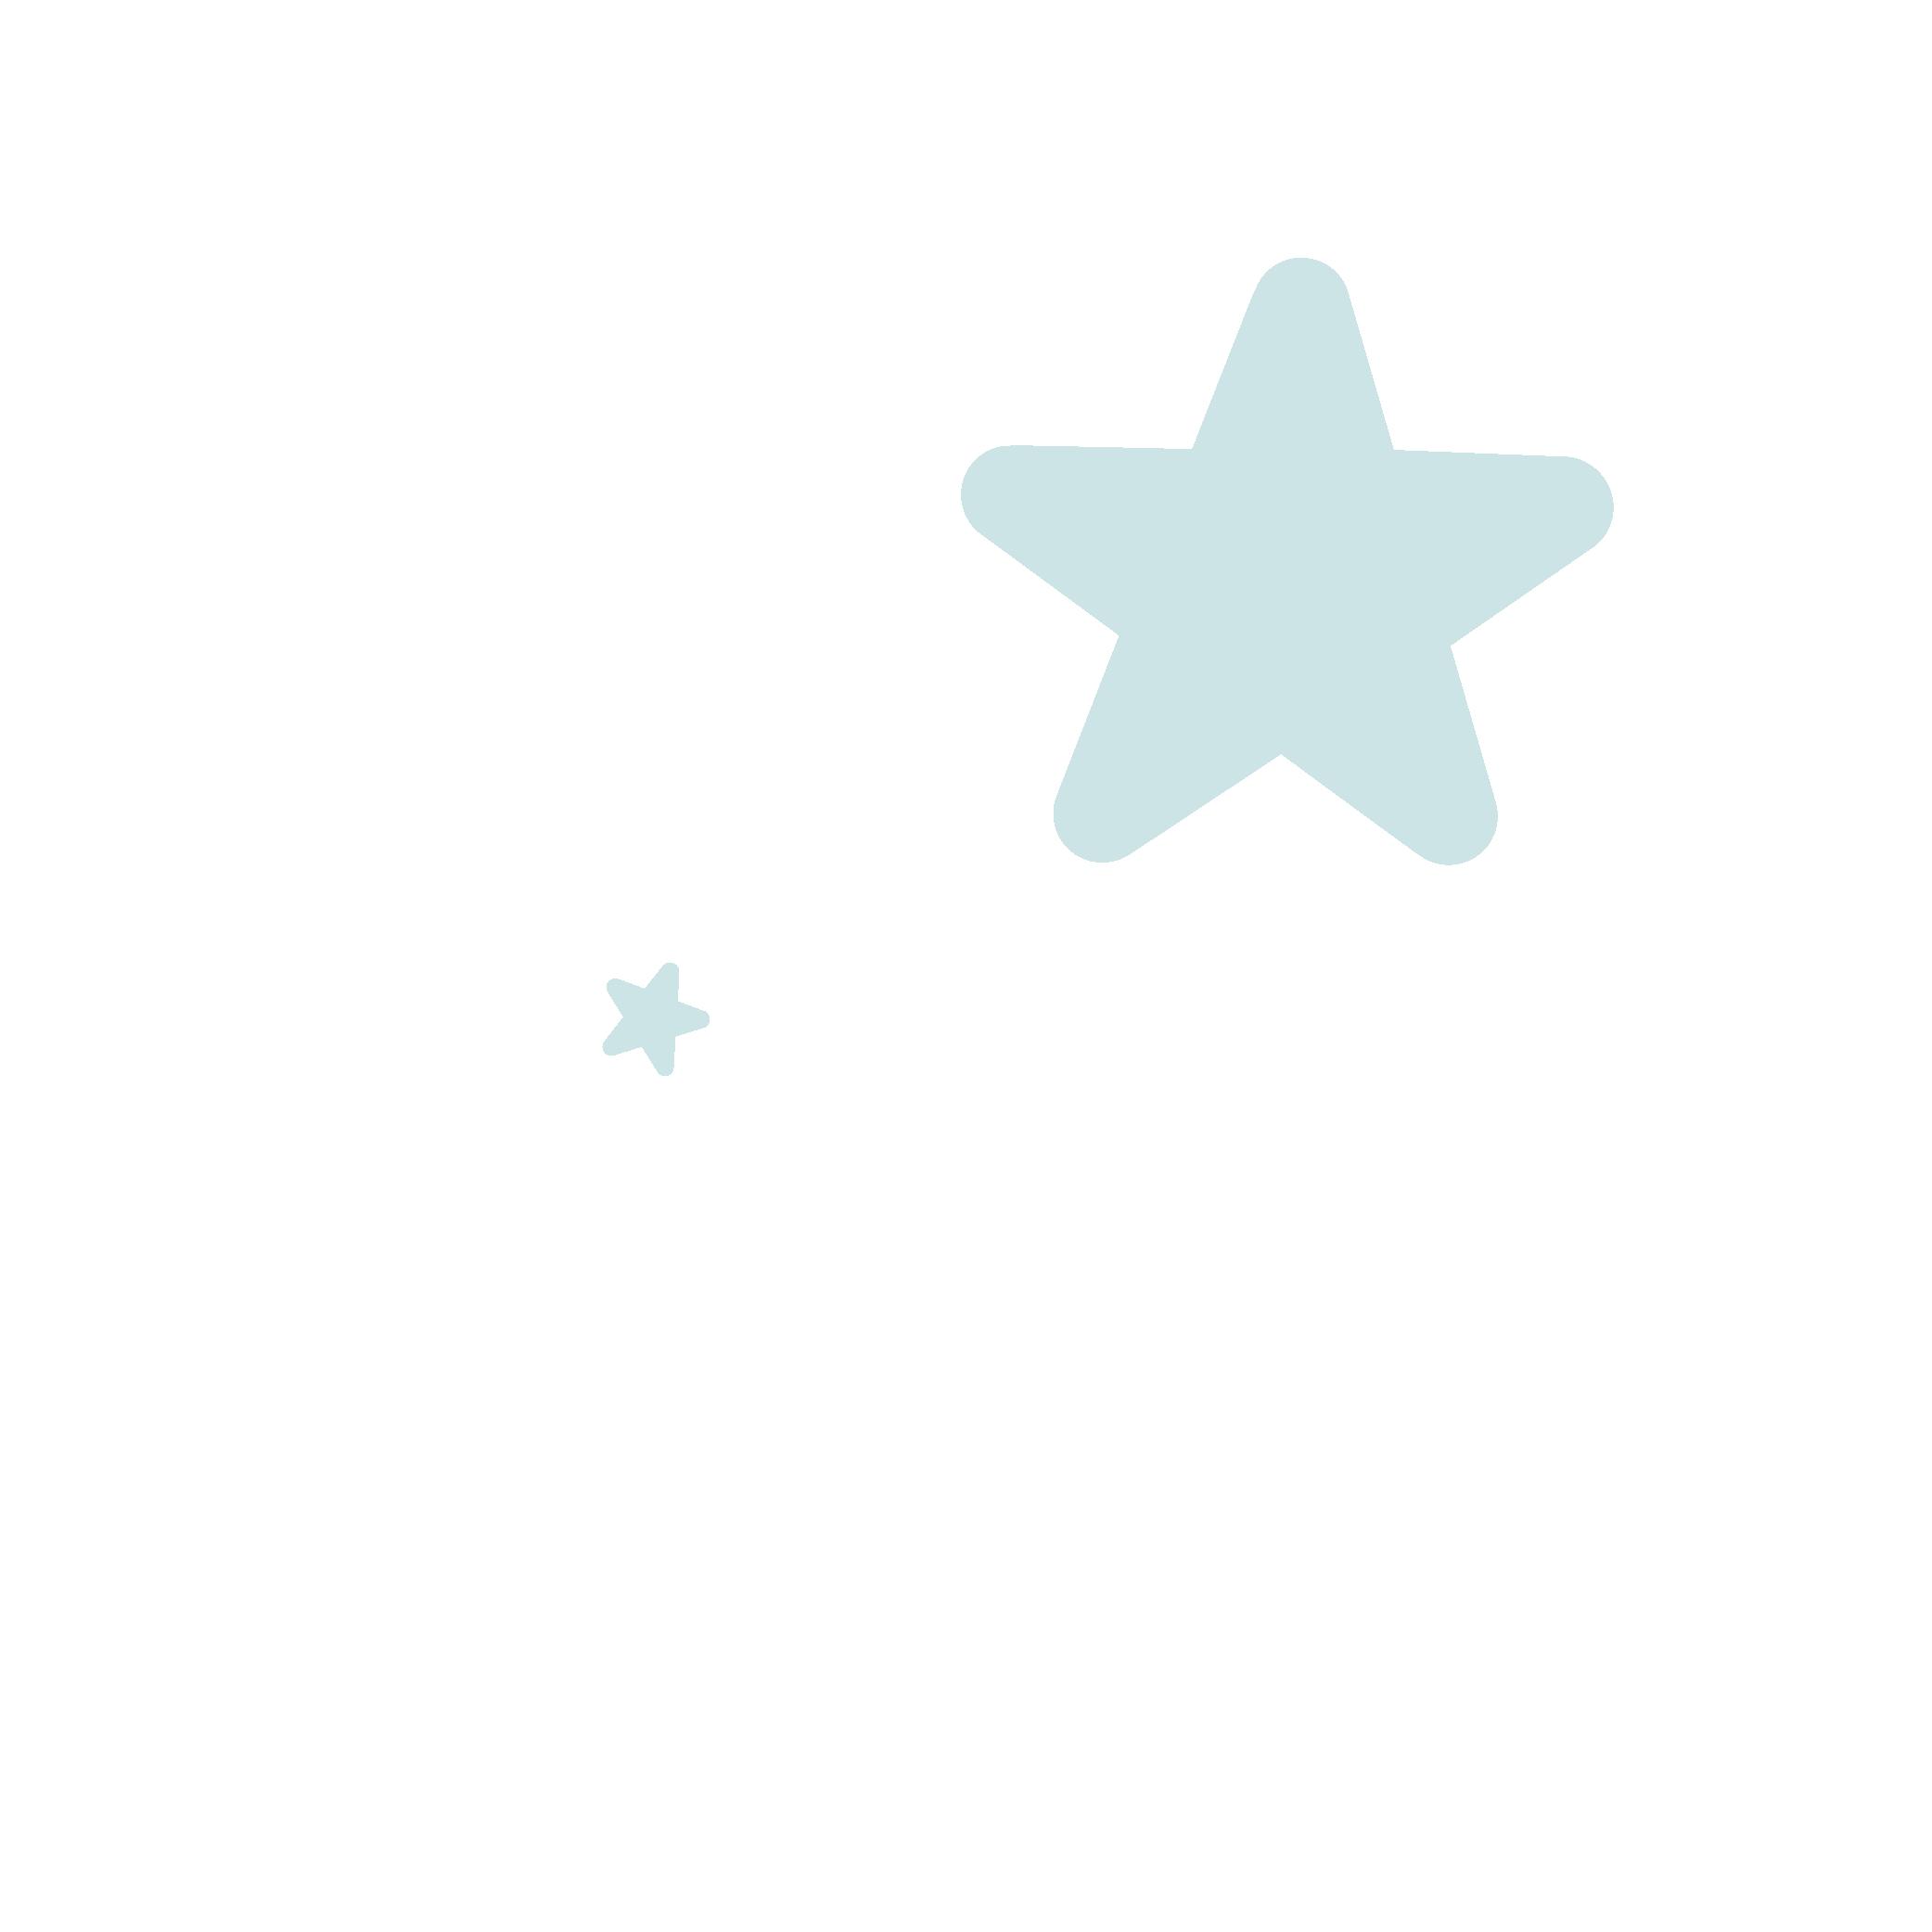 Starlite Web Background5.png